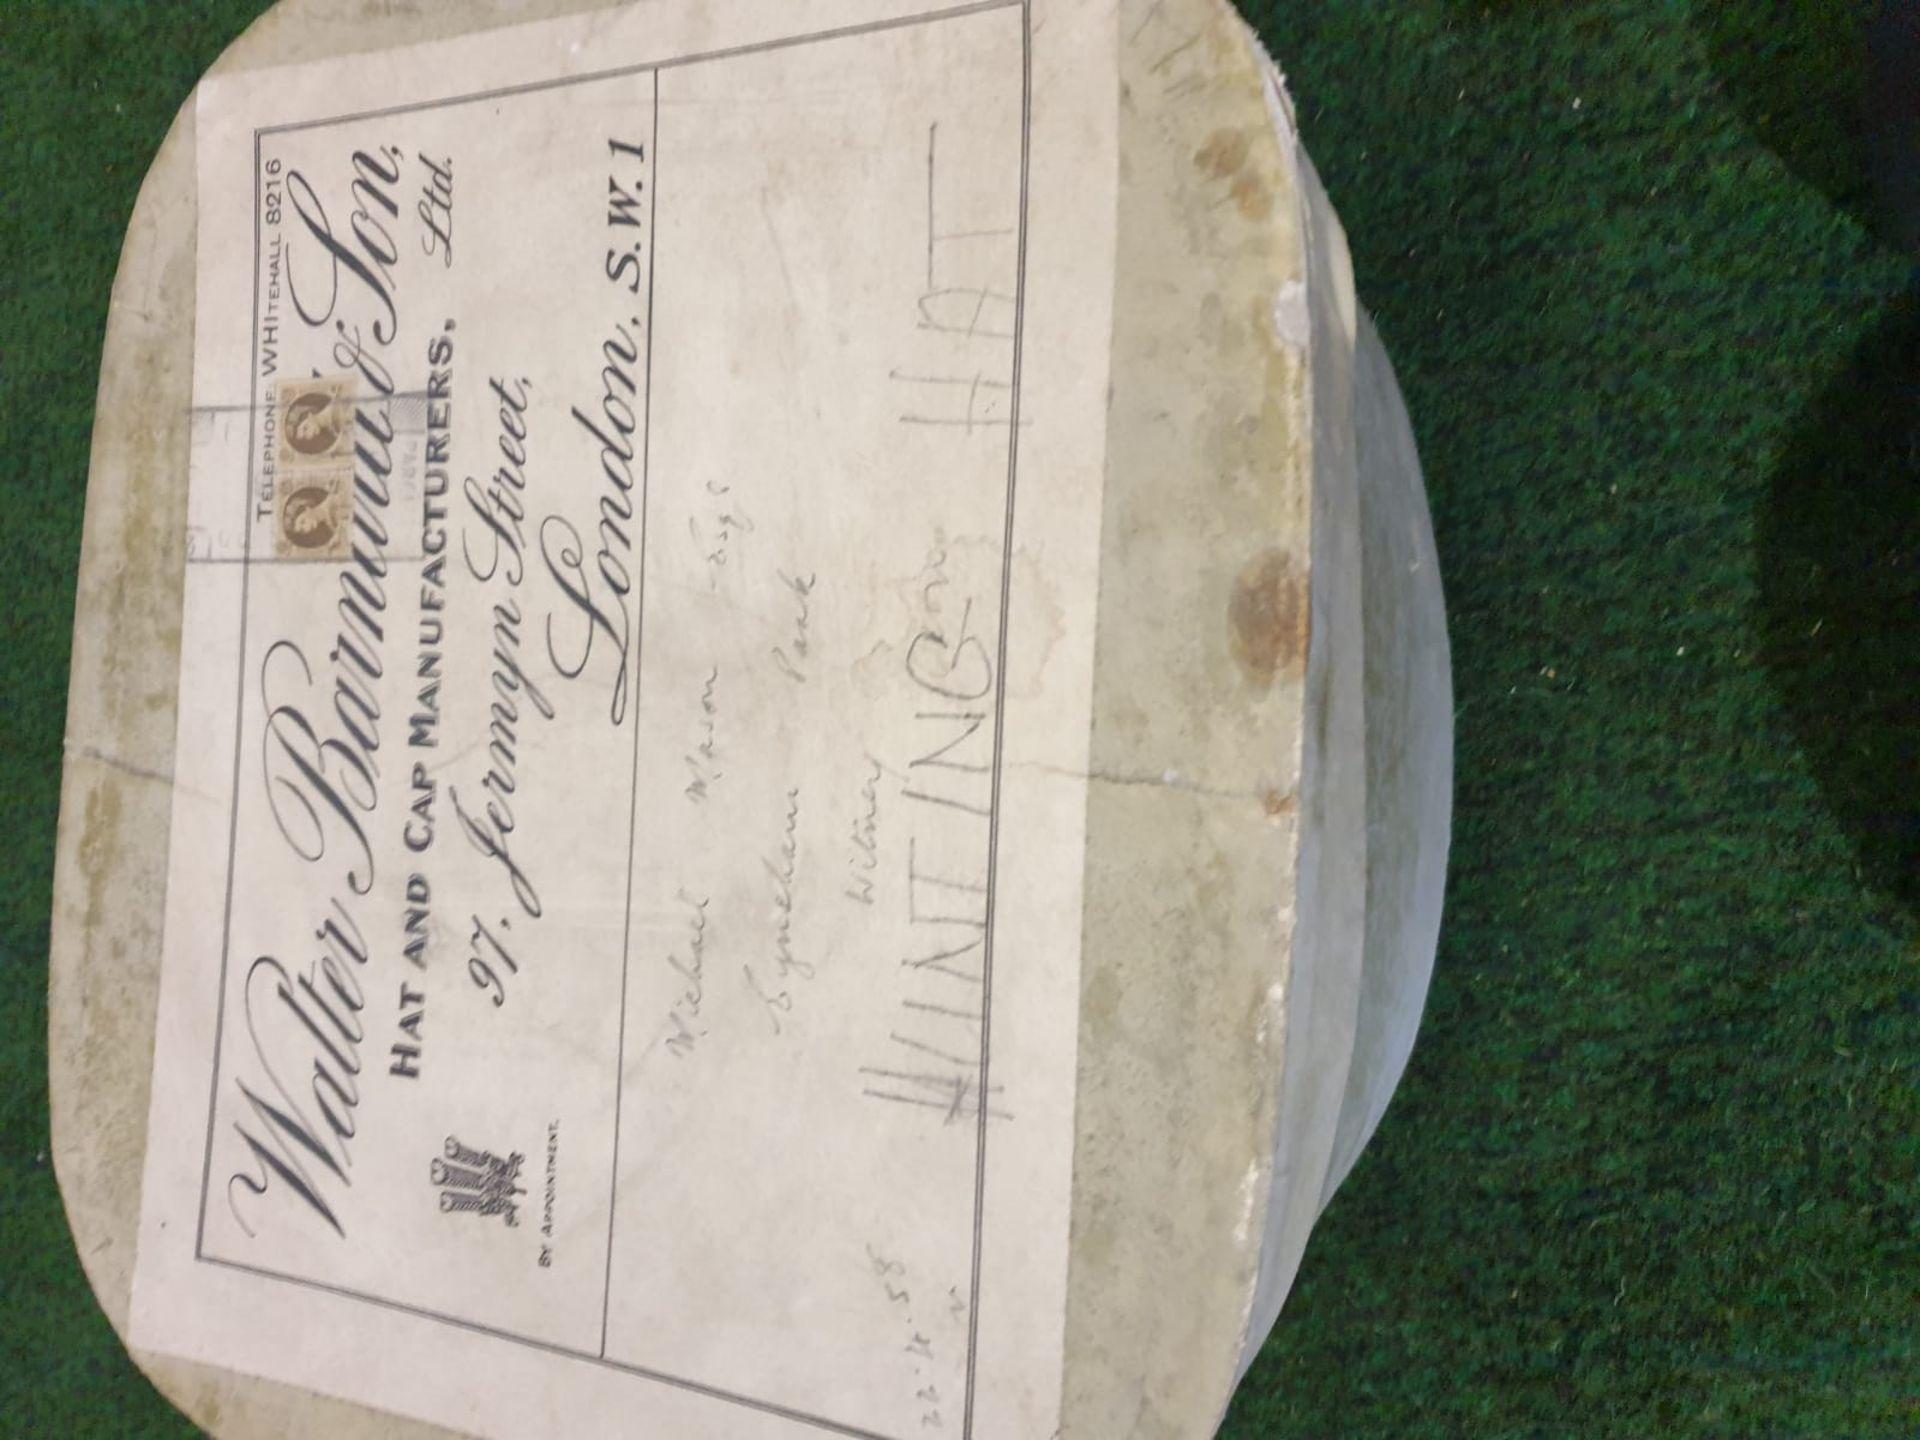 A James Lock + Co. Silk Black Top hat in a Waltar Barnhard card box - Image 4 of 4